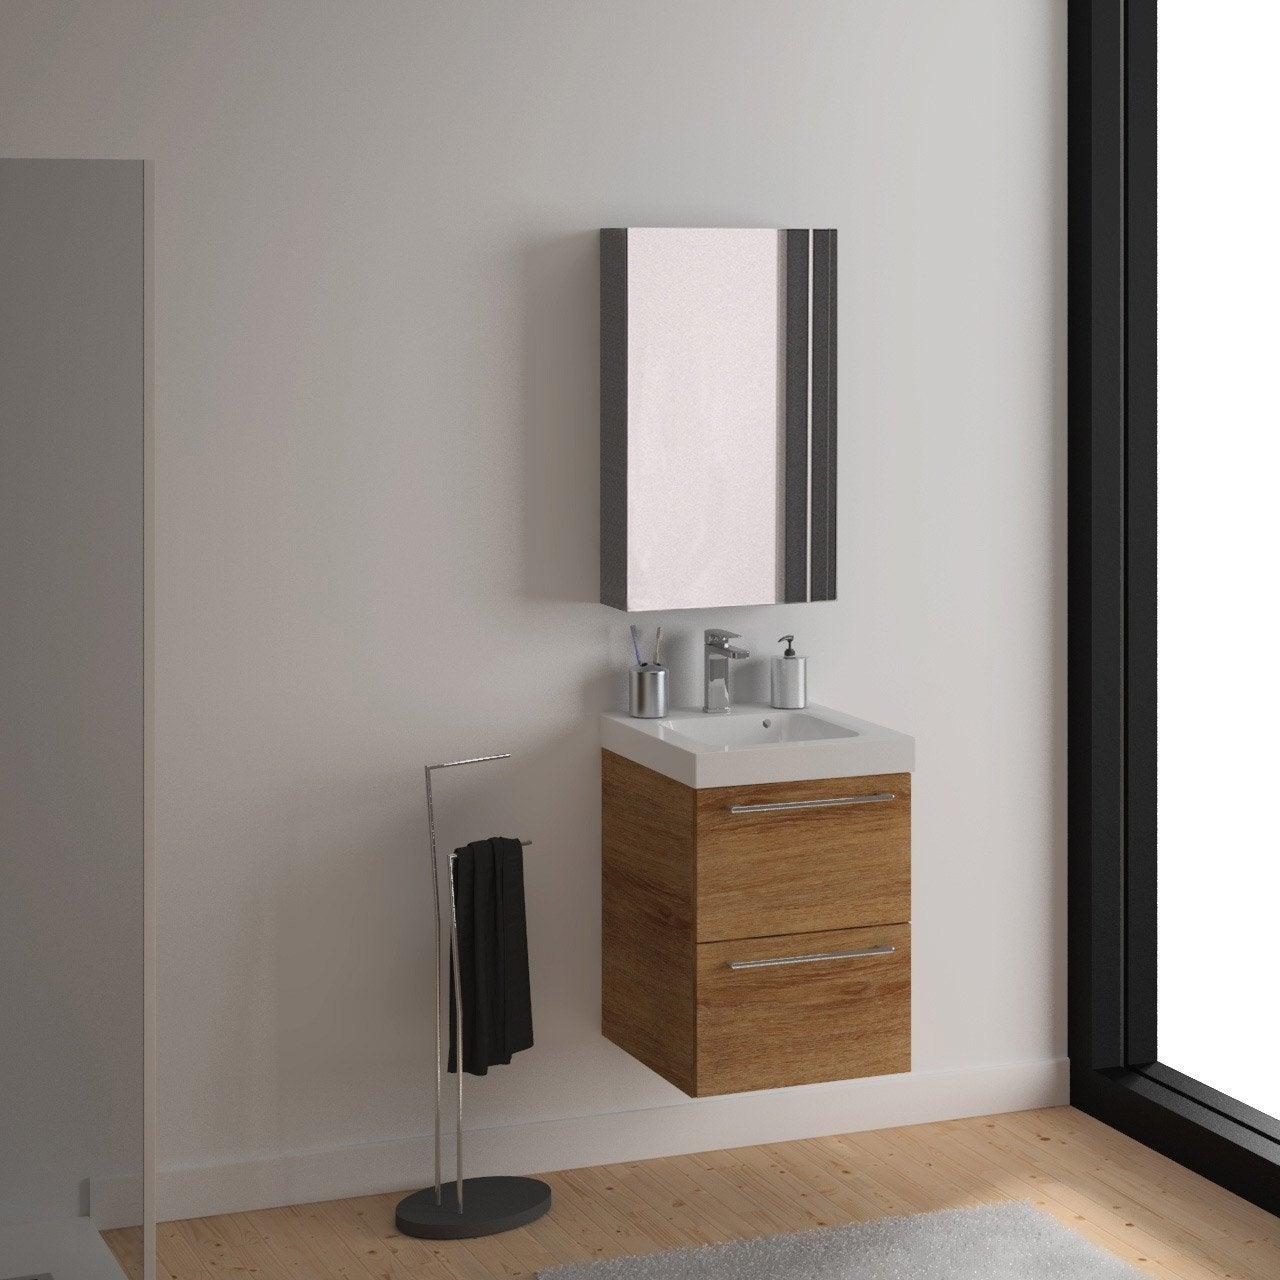 meuble vasque 46 cm remix leroy merlin. Black Bedroom Furniture Sets. Home Design Ideas